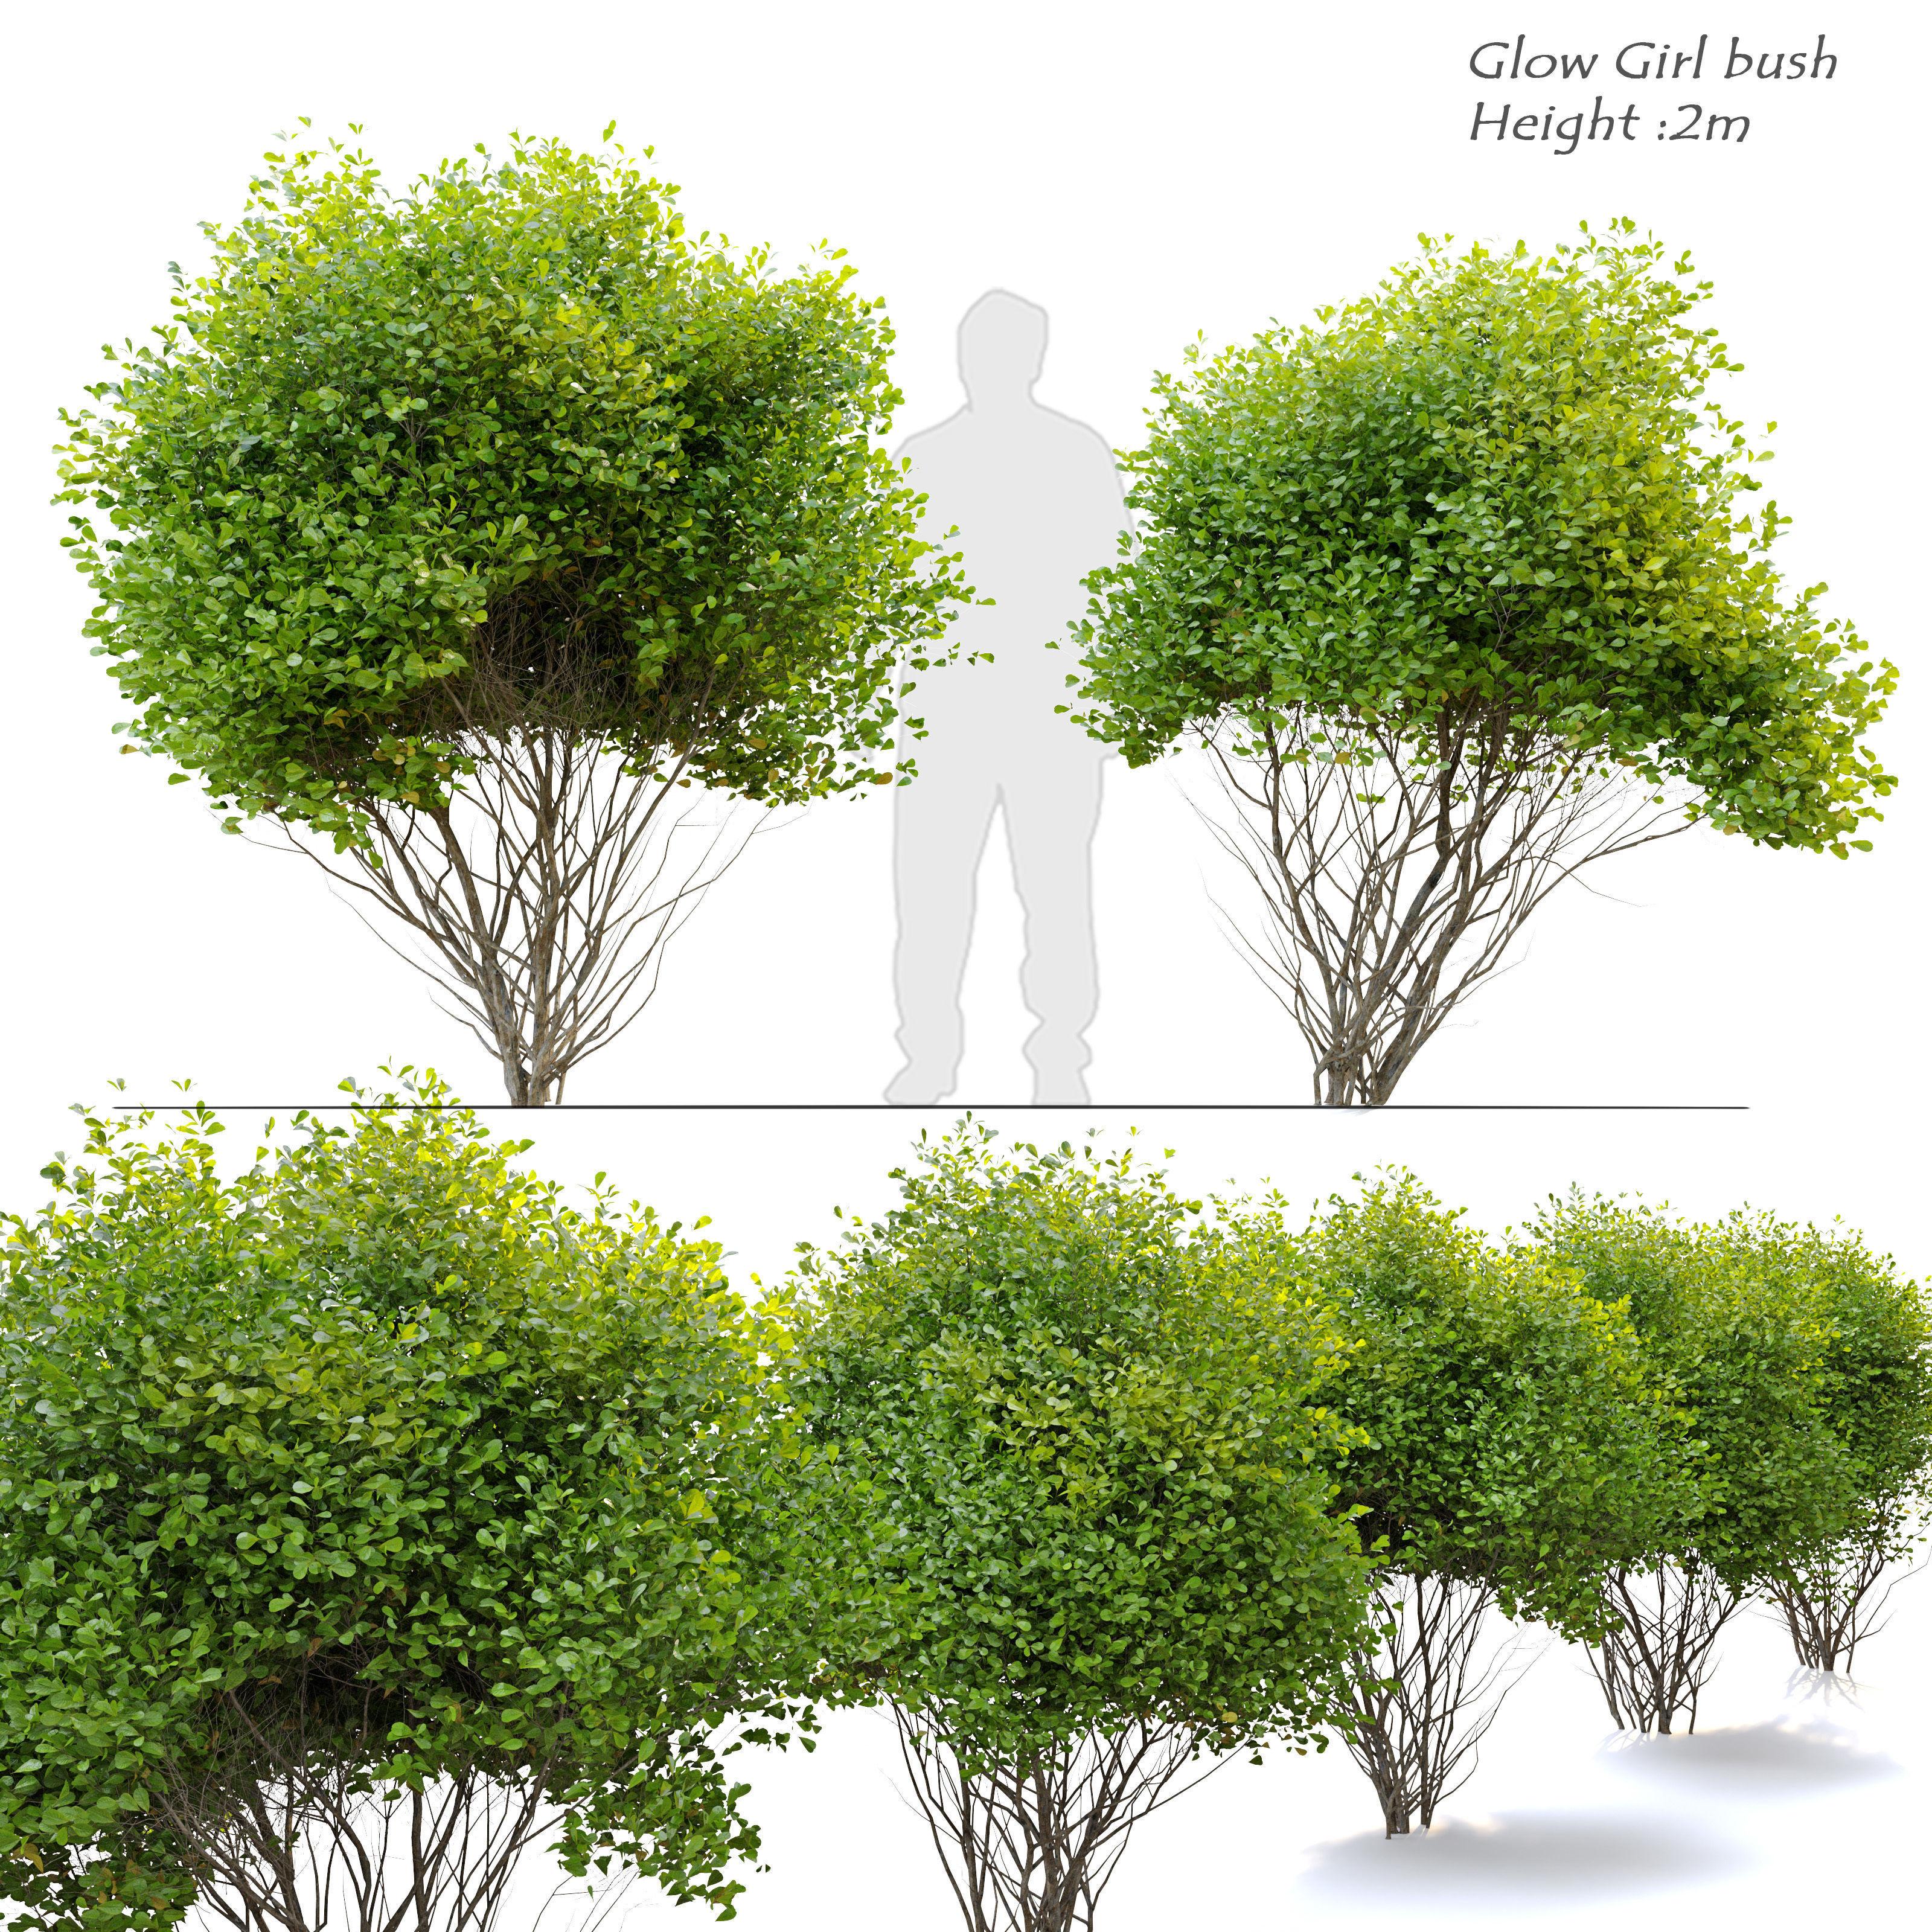 Glow girl bush